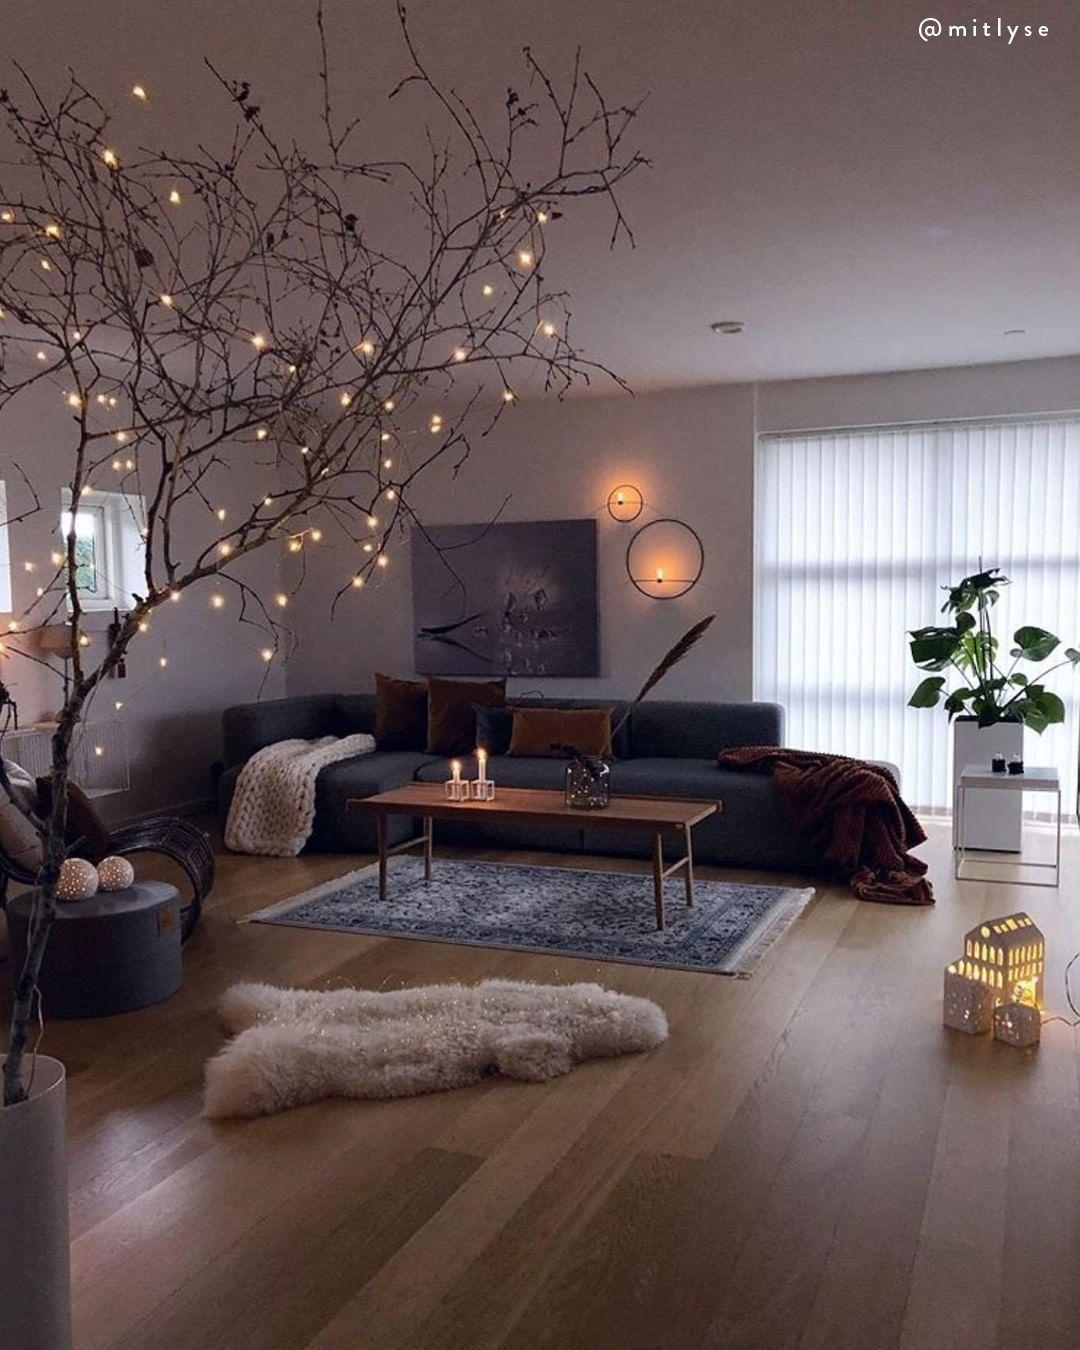 Come creare un'atmosfera magica in casa | Westwing